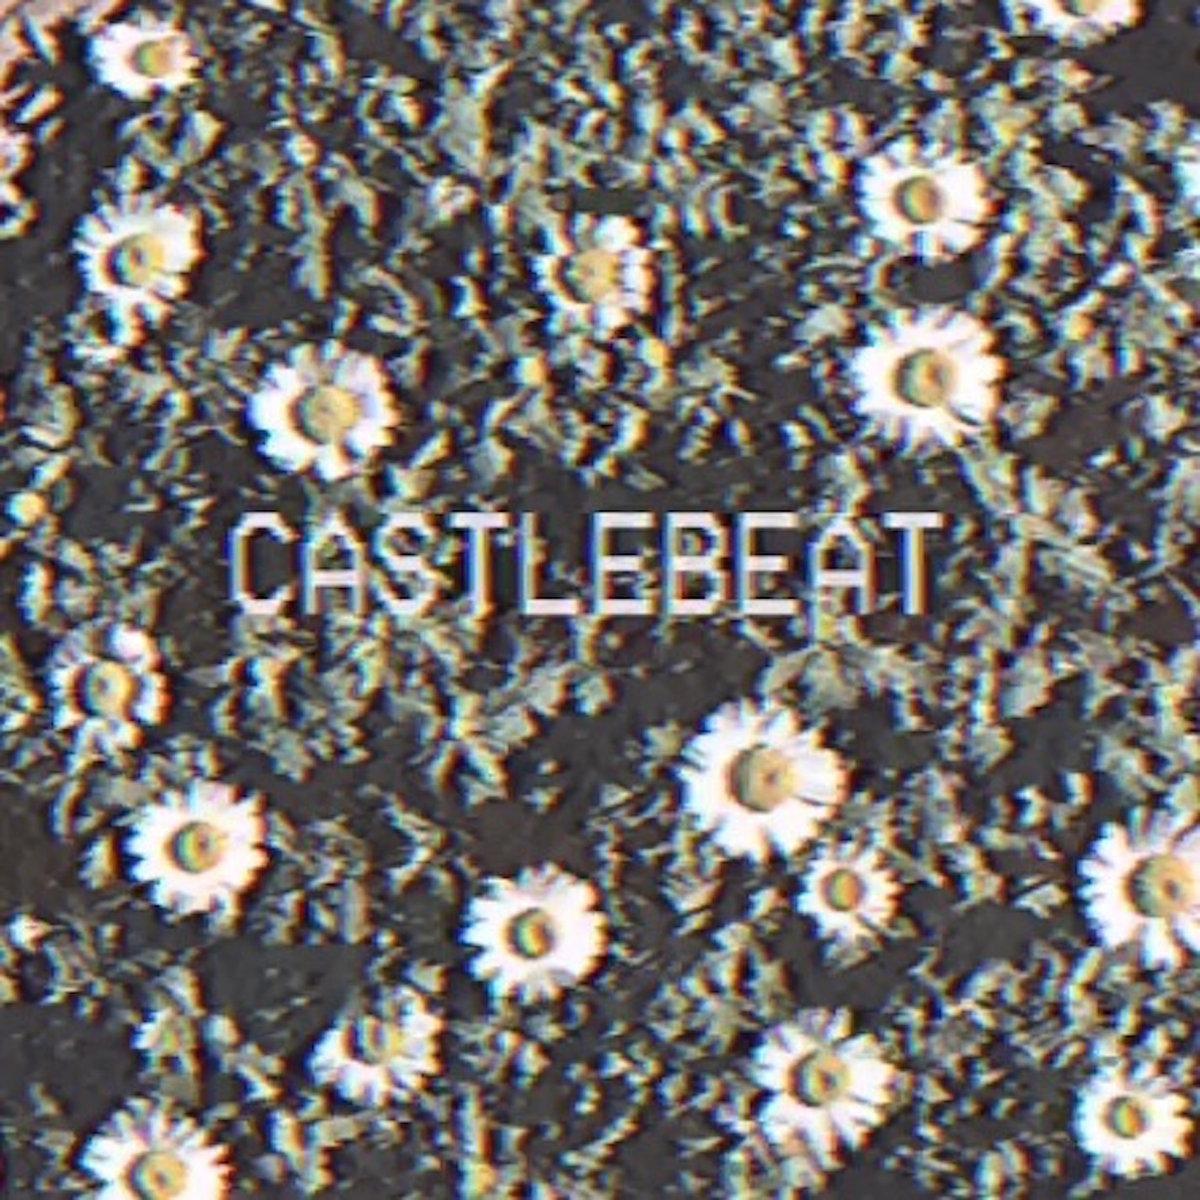 CASTLEBEAT / CASTLEBEAT(LP)